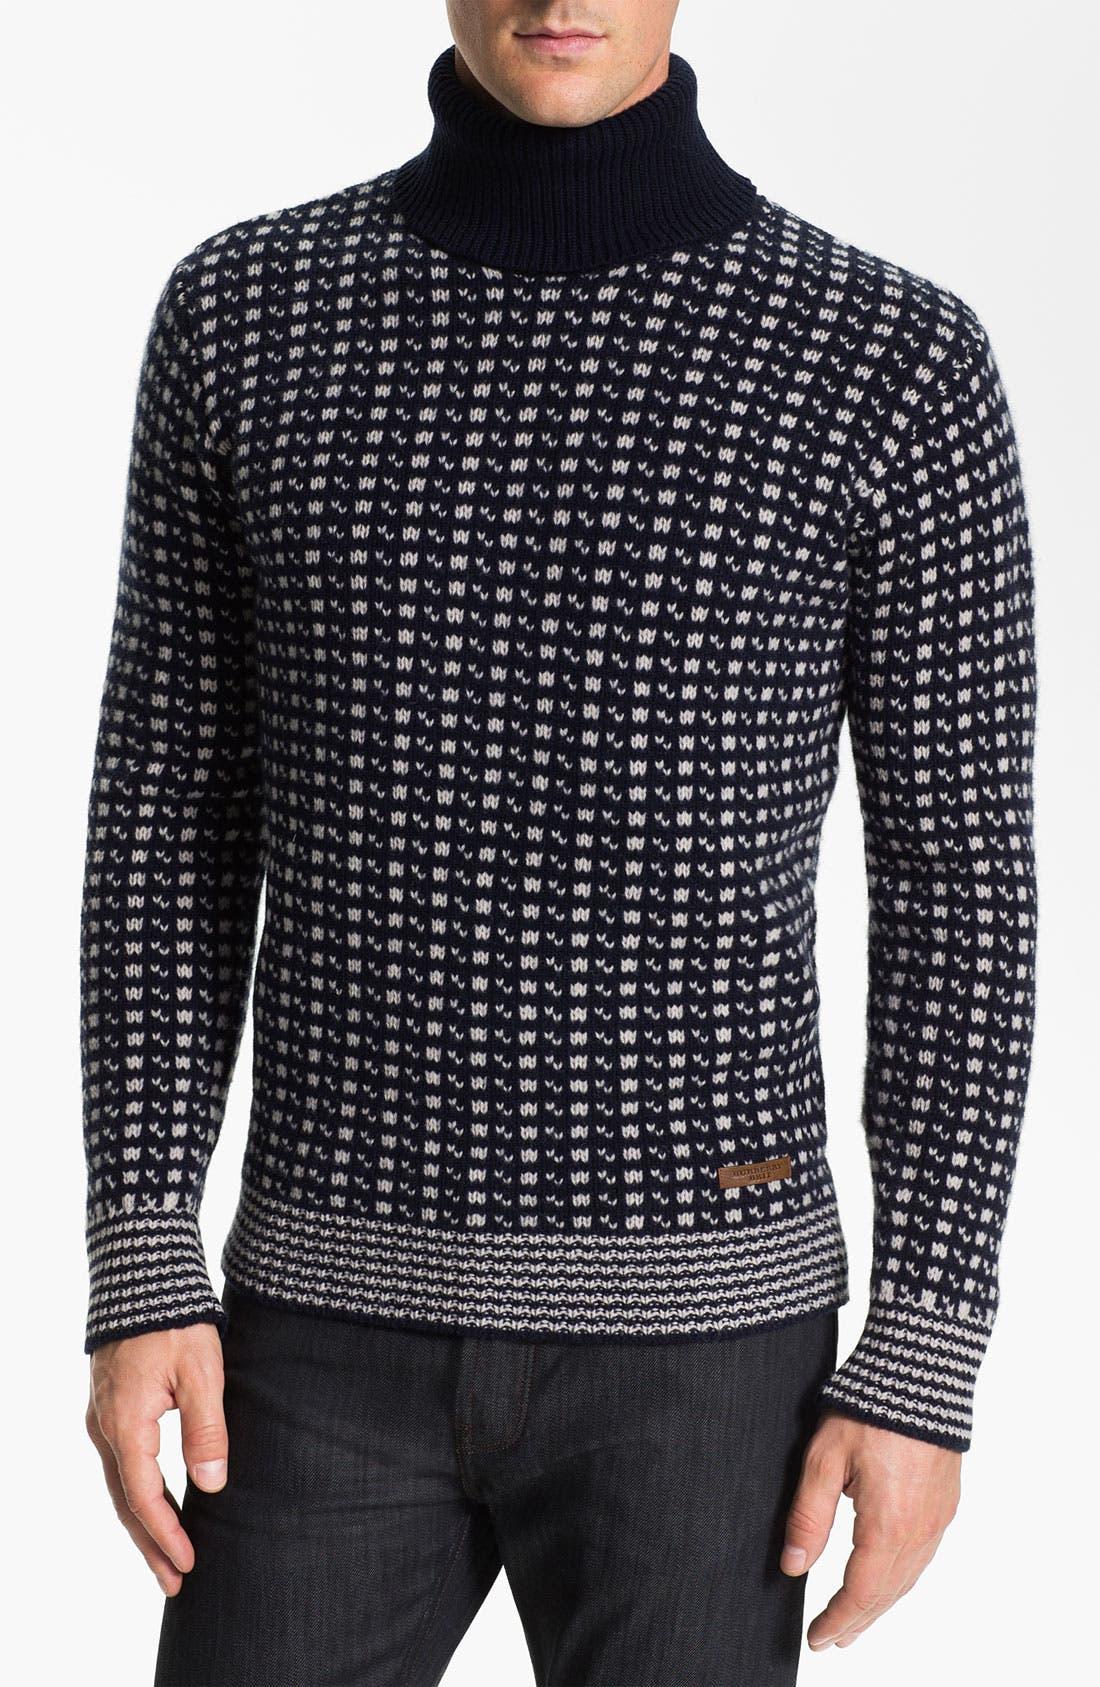 Alternate Image 1 Selected - Burberry Brit Turtleneck Wool Sweater